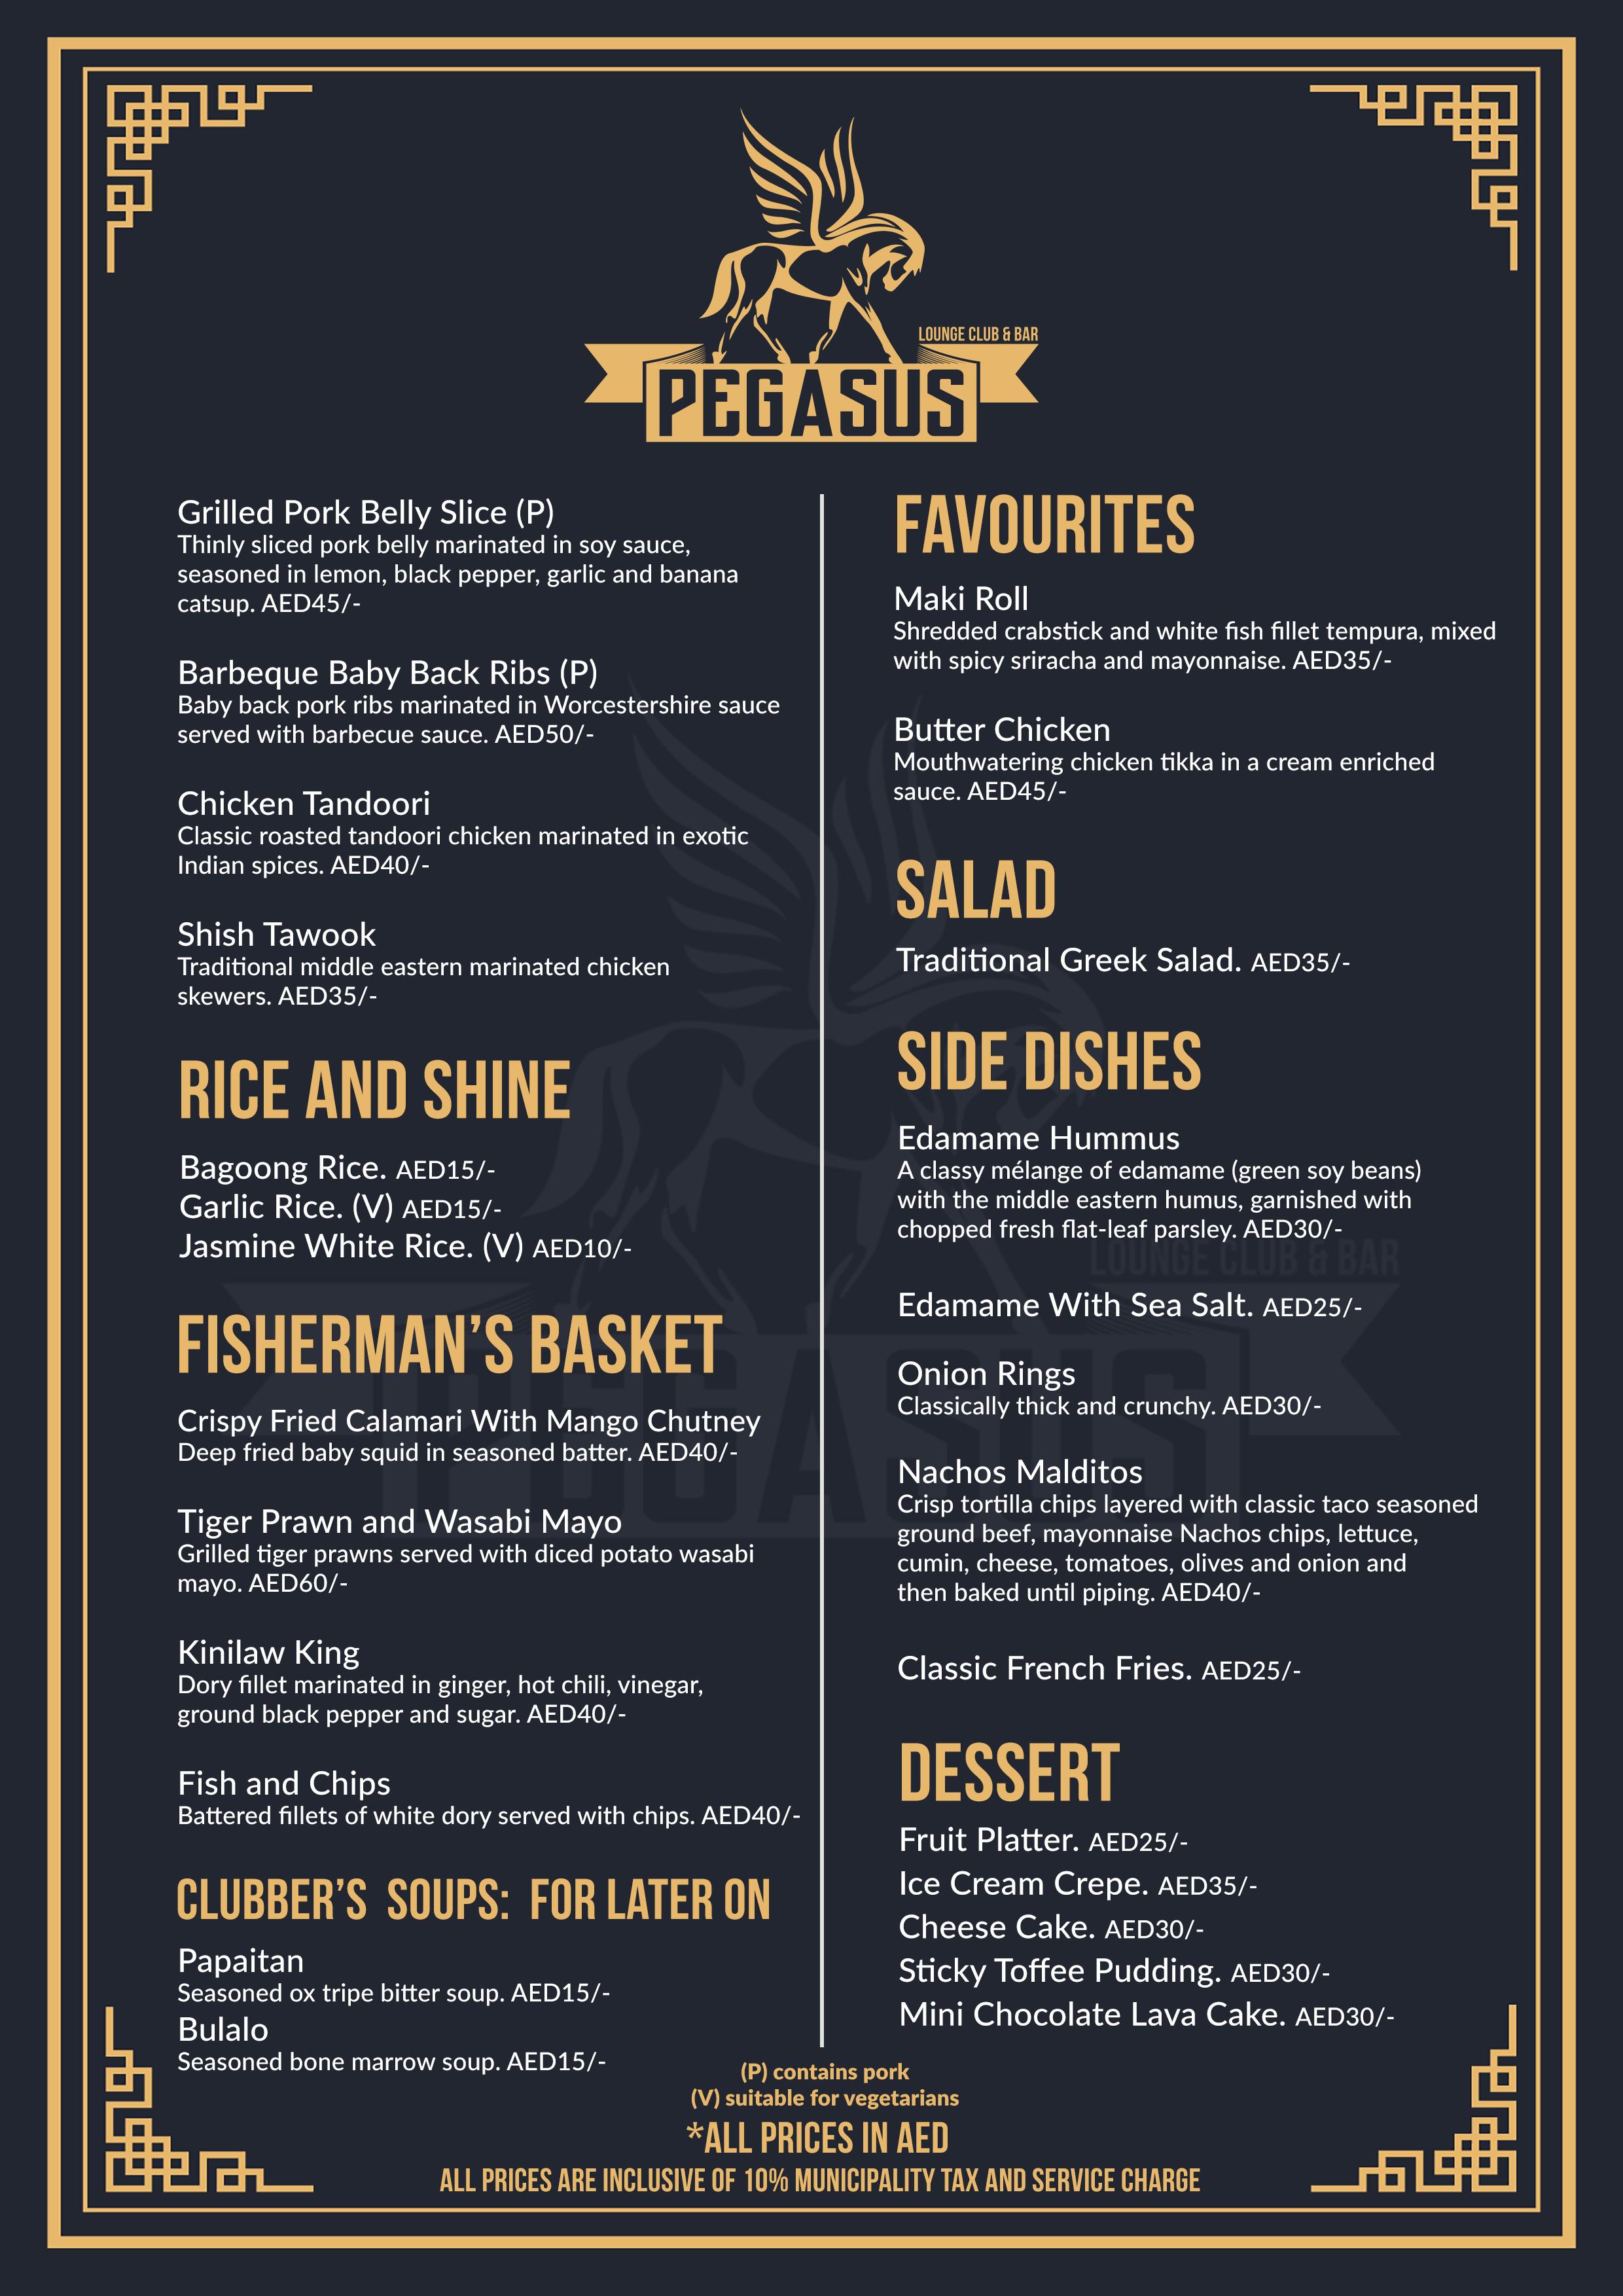 Pegasus Lounge Club Bar Menu1